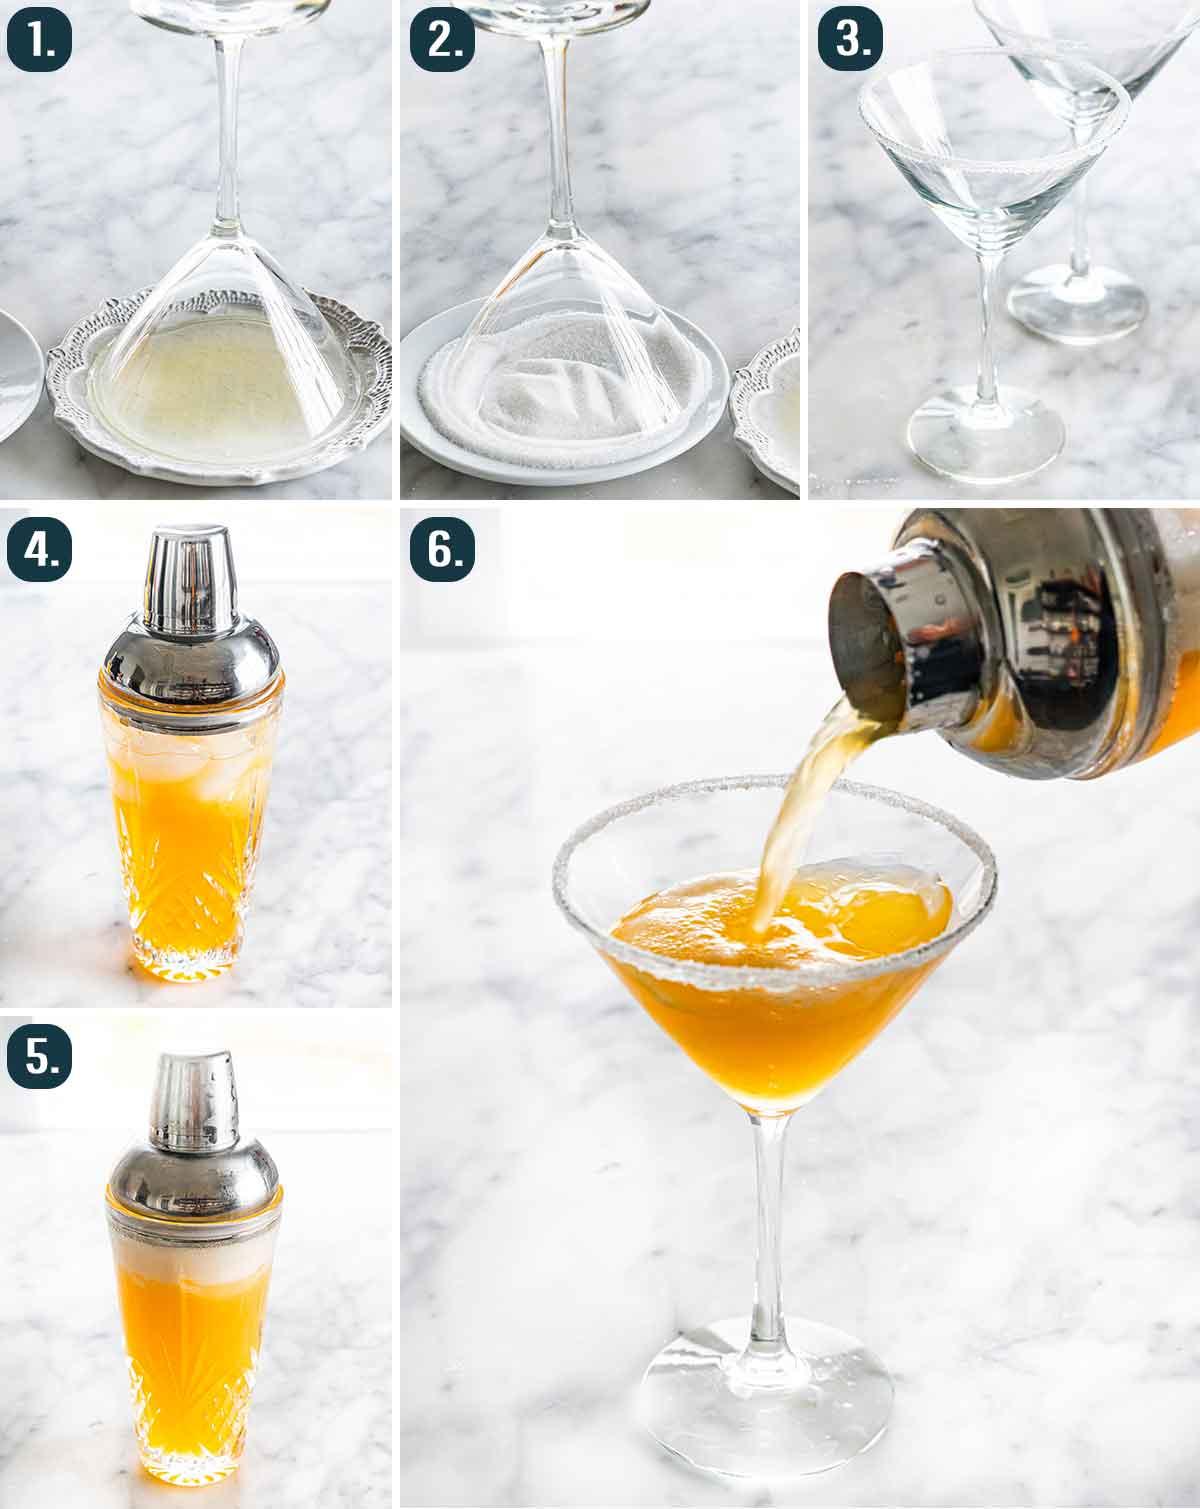 process shots showing how to make an earl grey martini